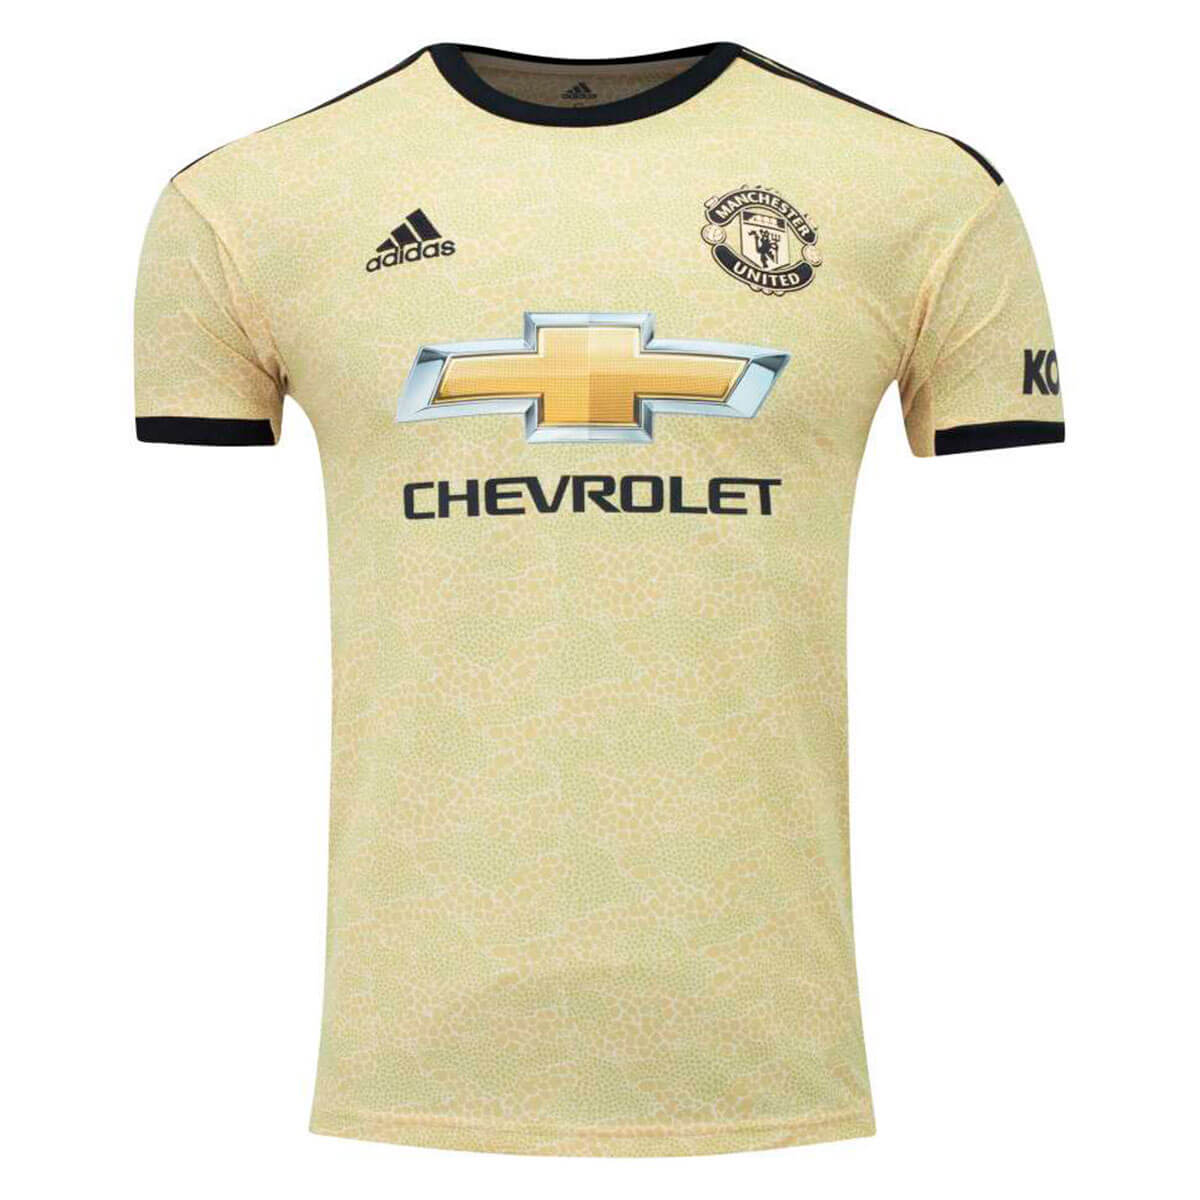 Camisa Manchester Untd Adidas Of 2 Masculino - Dourado